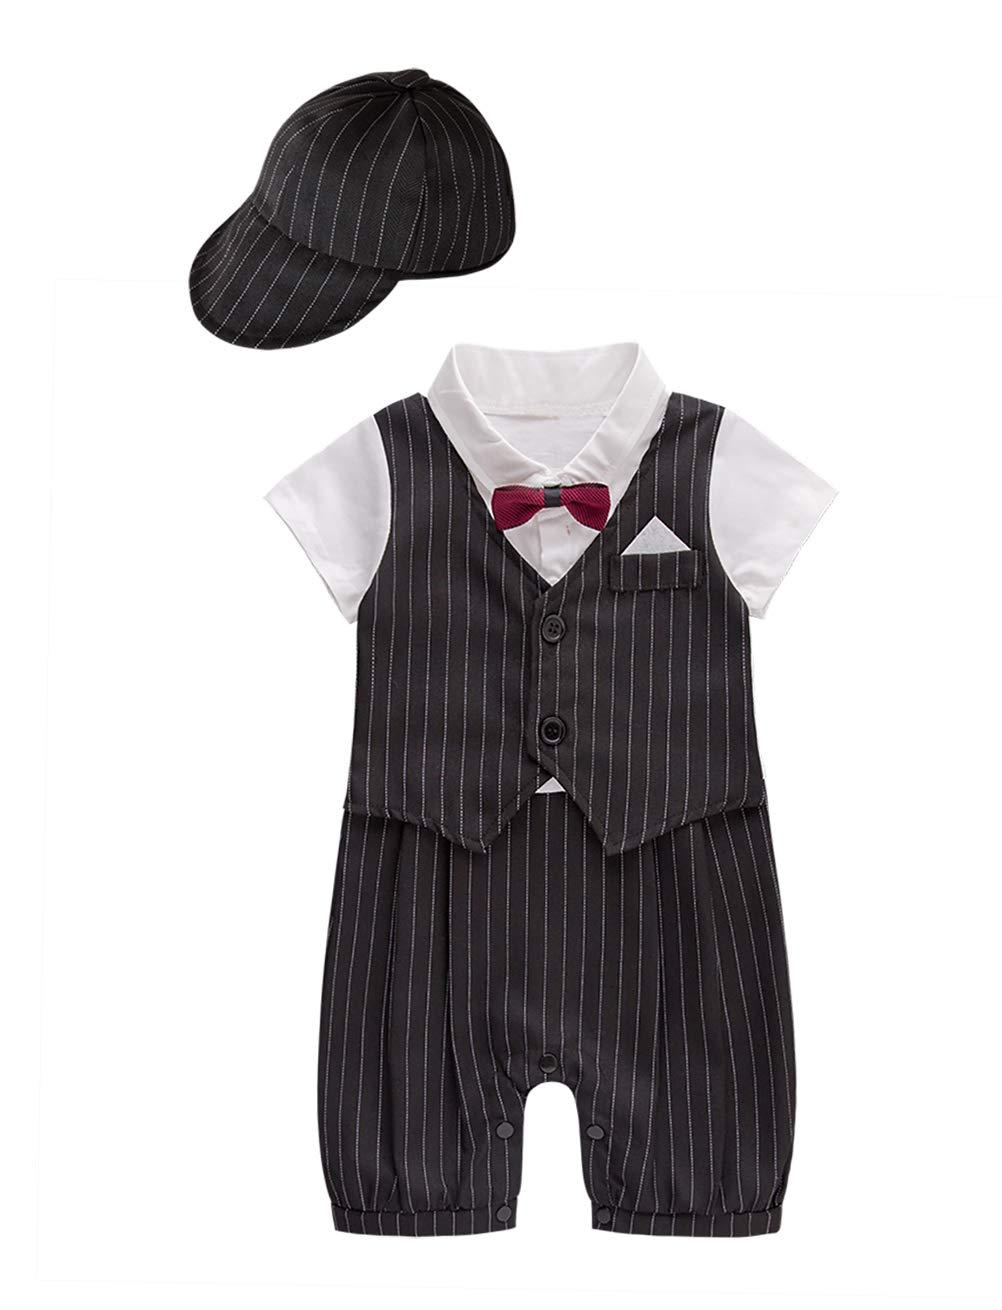 XM Nyan May's Baby Toddler Boys Bowtie Faux Vest Romper Onesie (3-6 Months, Black B)